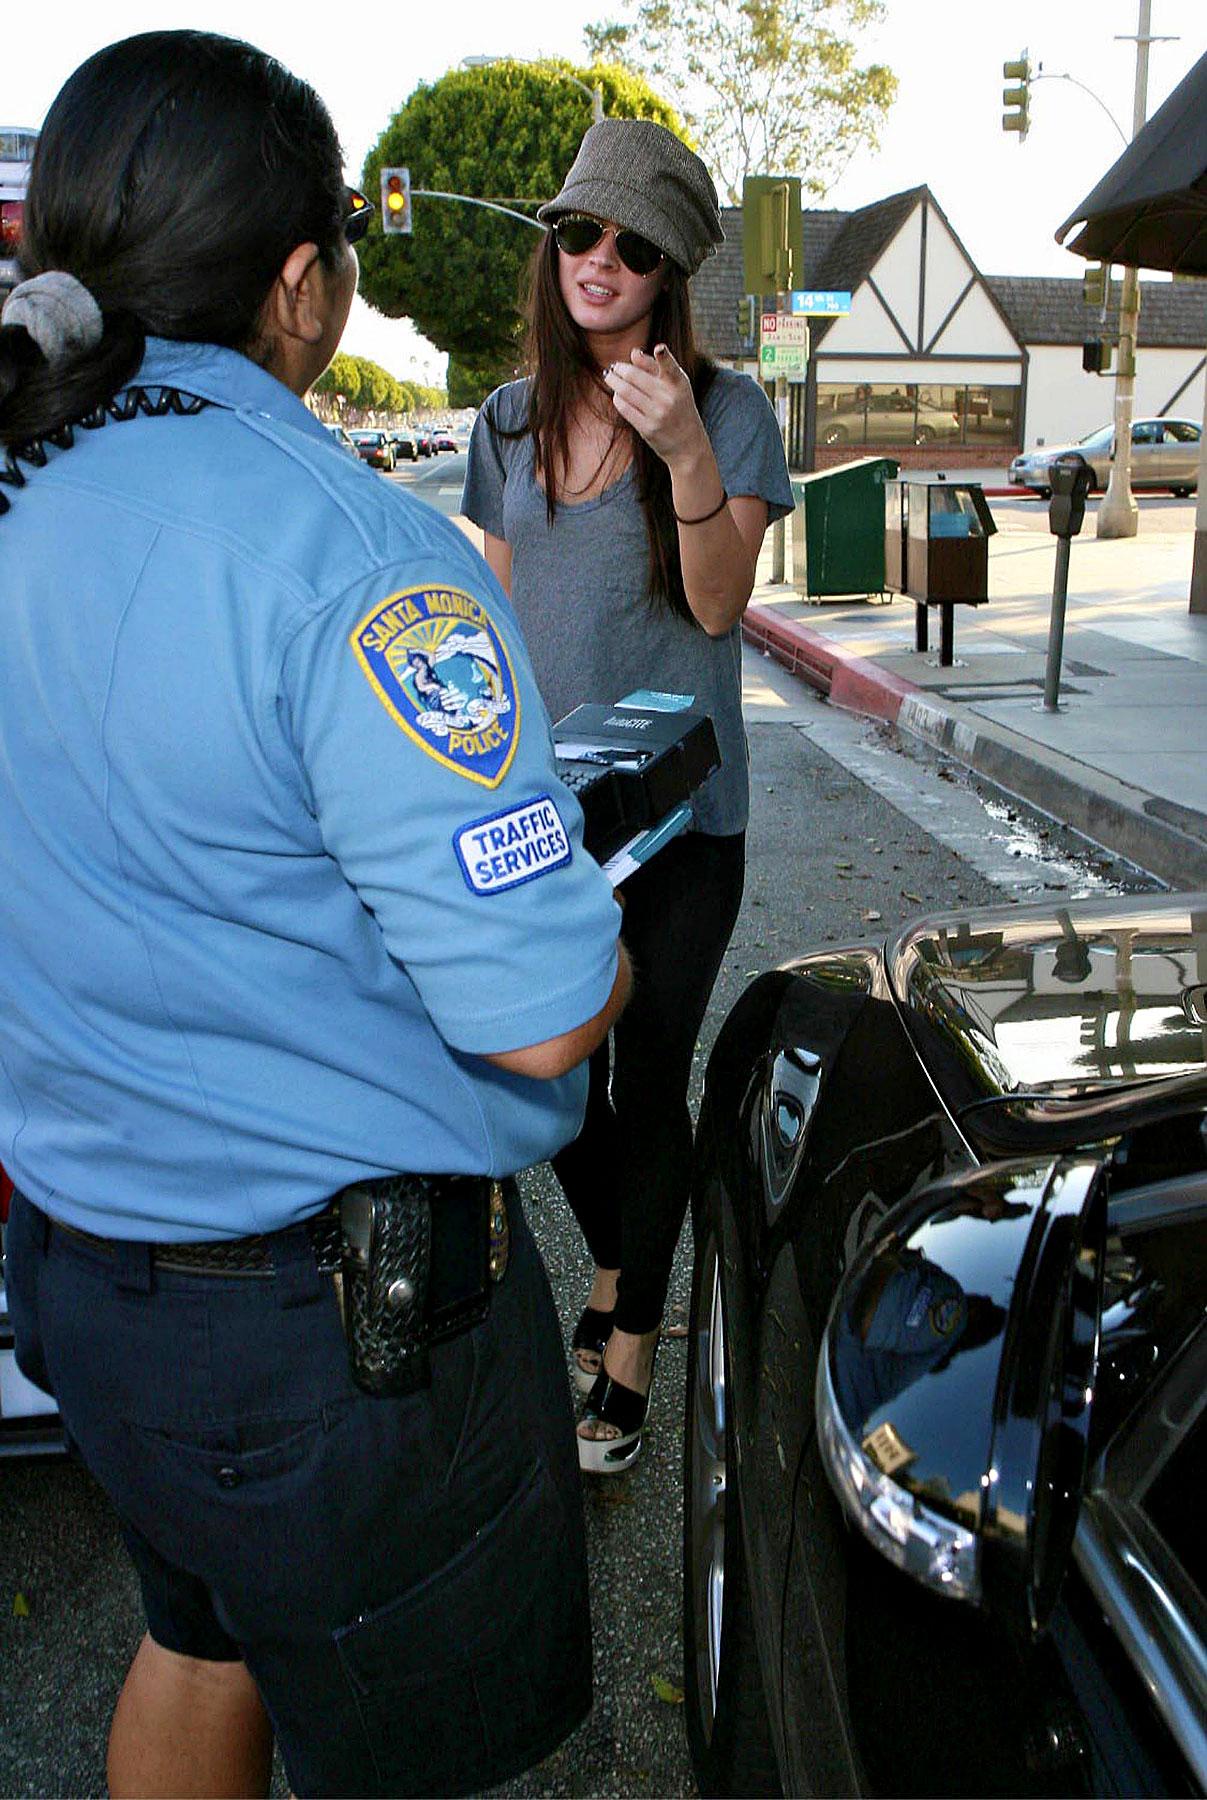 PHOTO GALLERY: Megan Fox's Got the Ticket